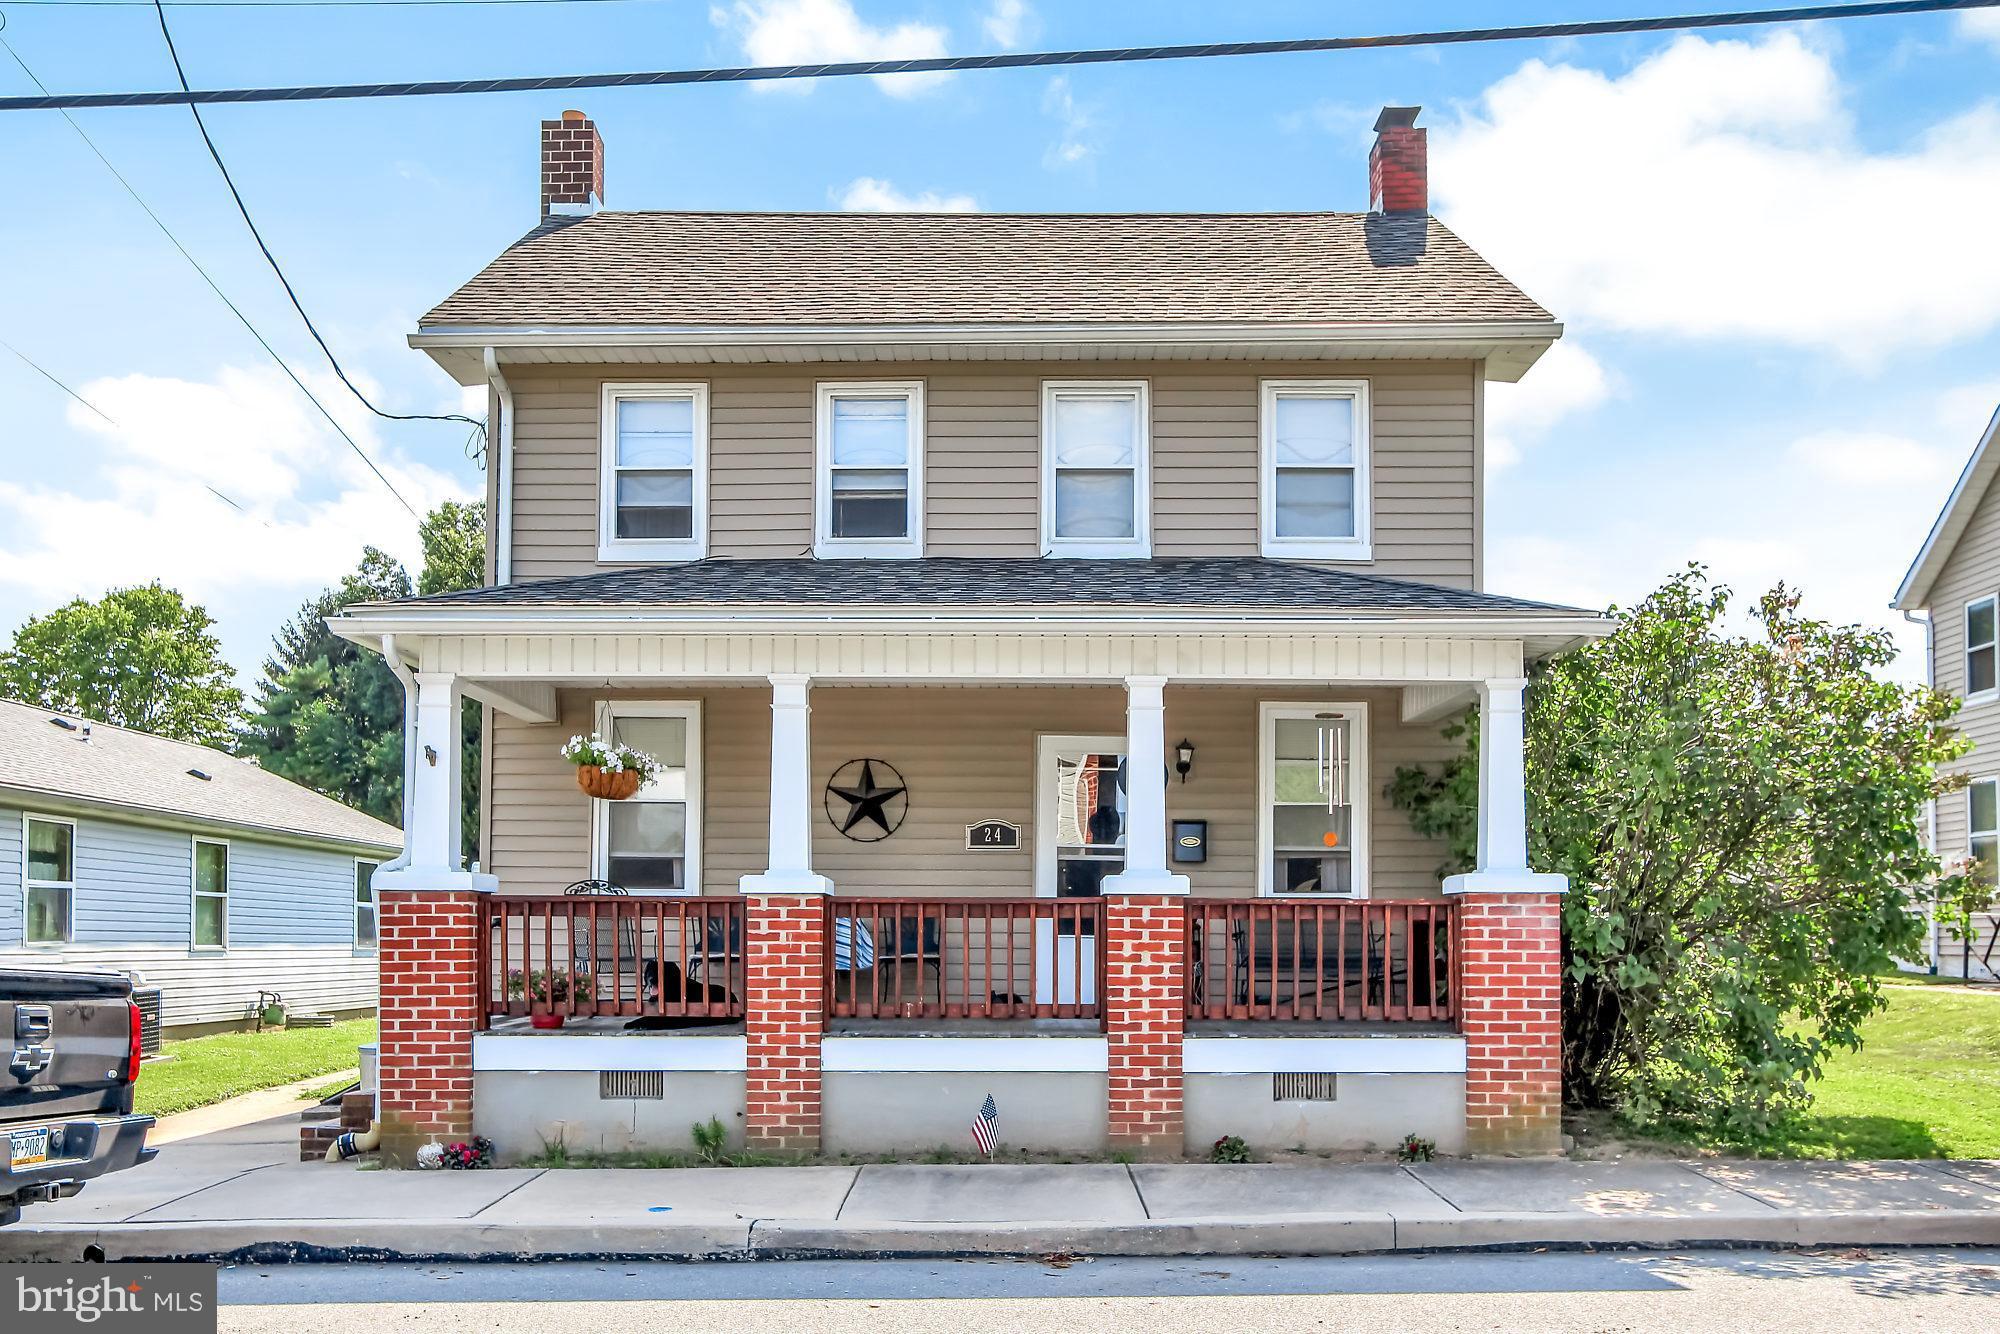 24 N MAIN STREET, EAST PROSPECT, PA 17317